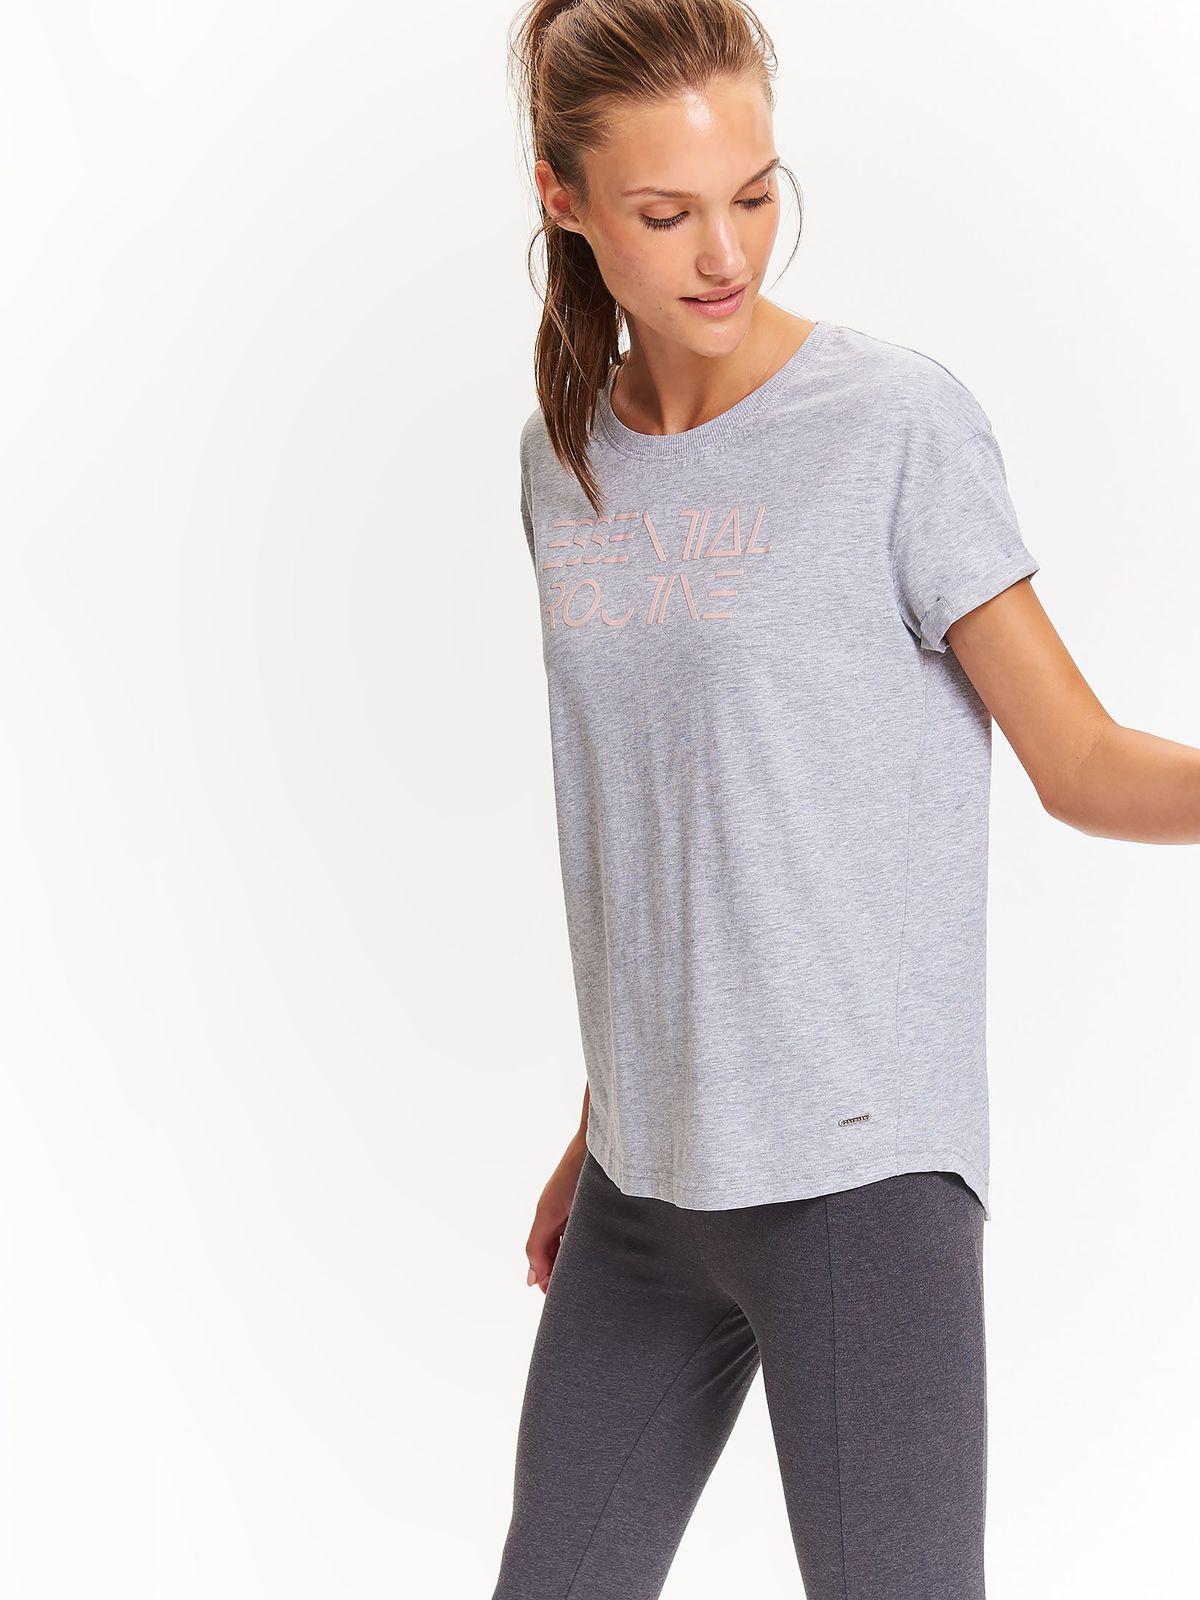 DRYWASH DRYWASH γυναικειο t-shirt με print